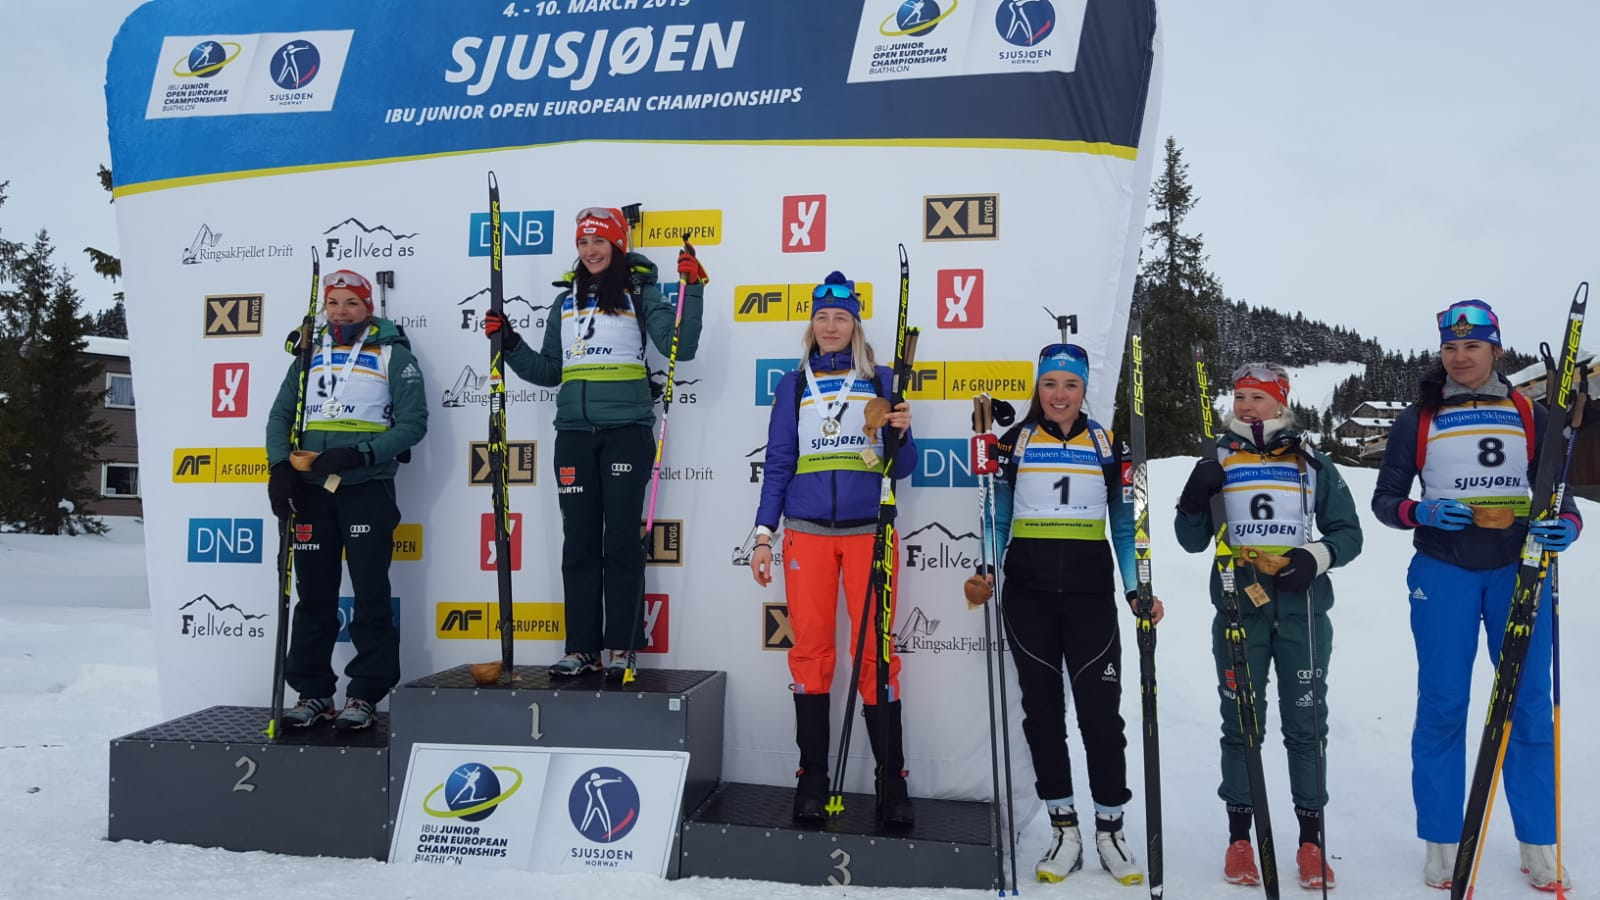 Medaillenreiche Europameisterschaft in Sjusjoen